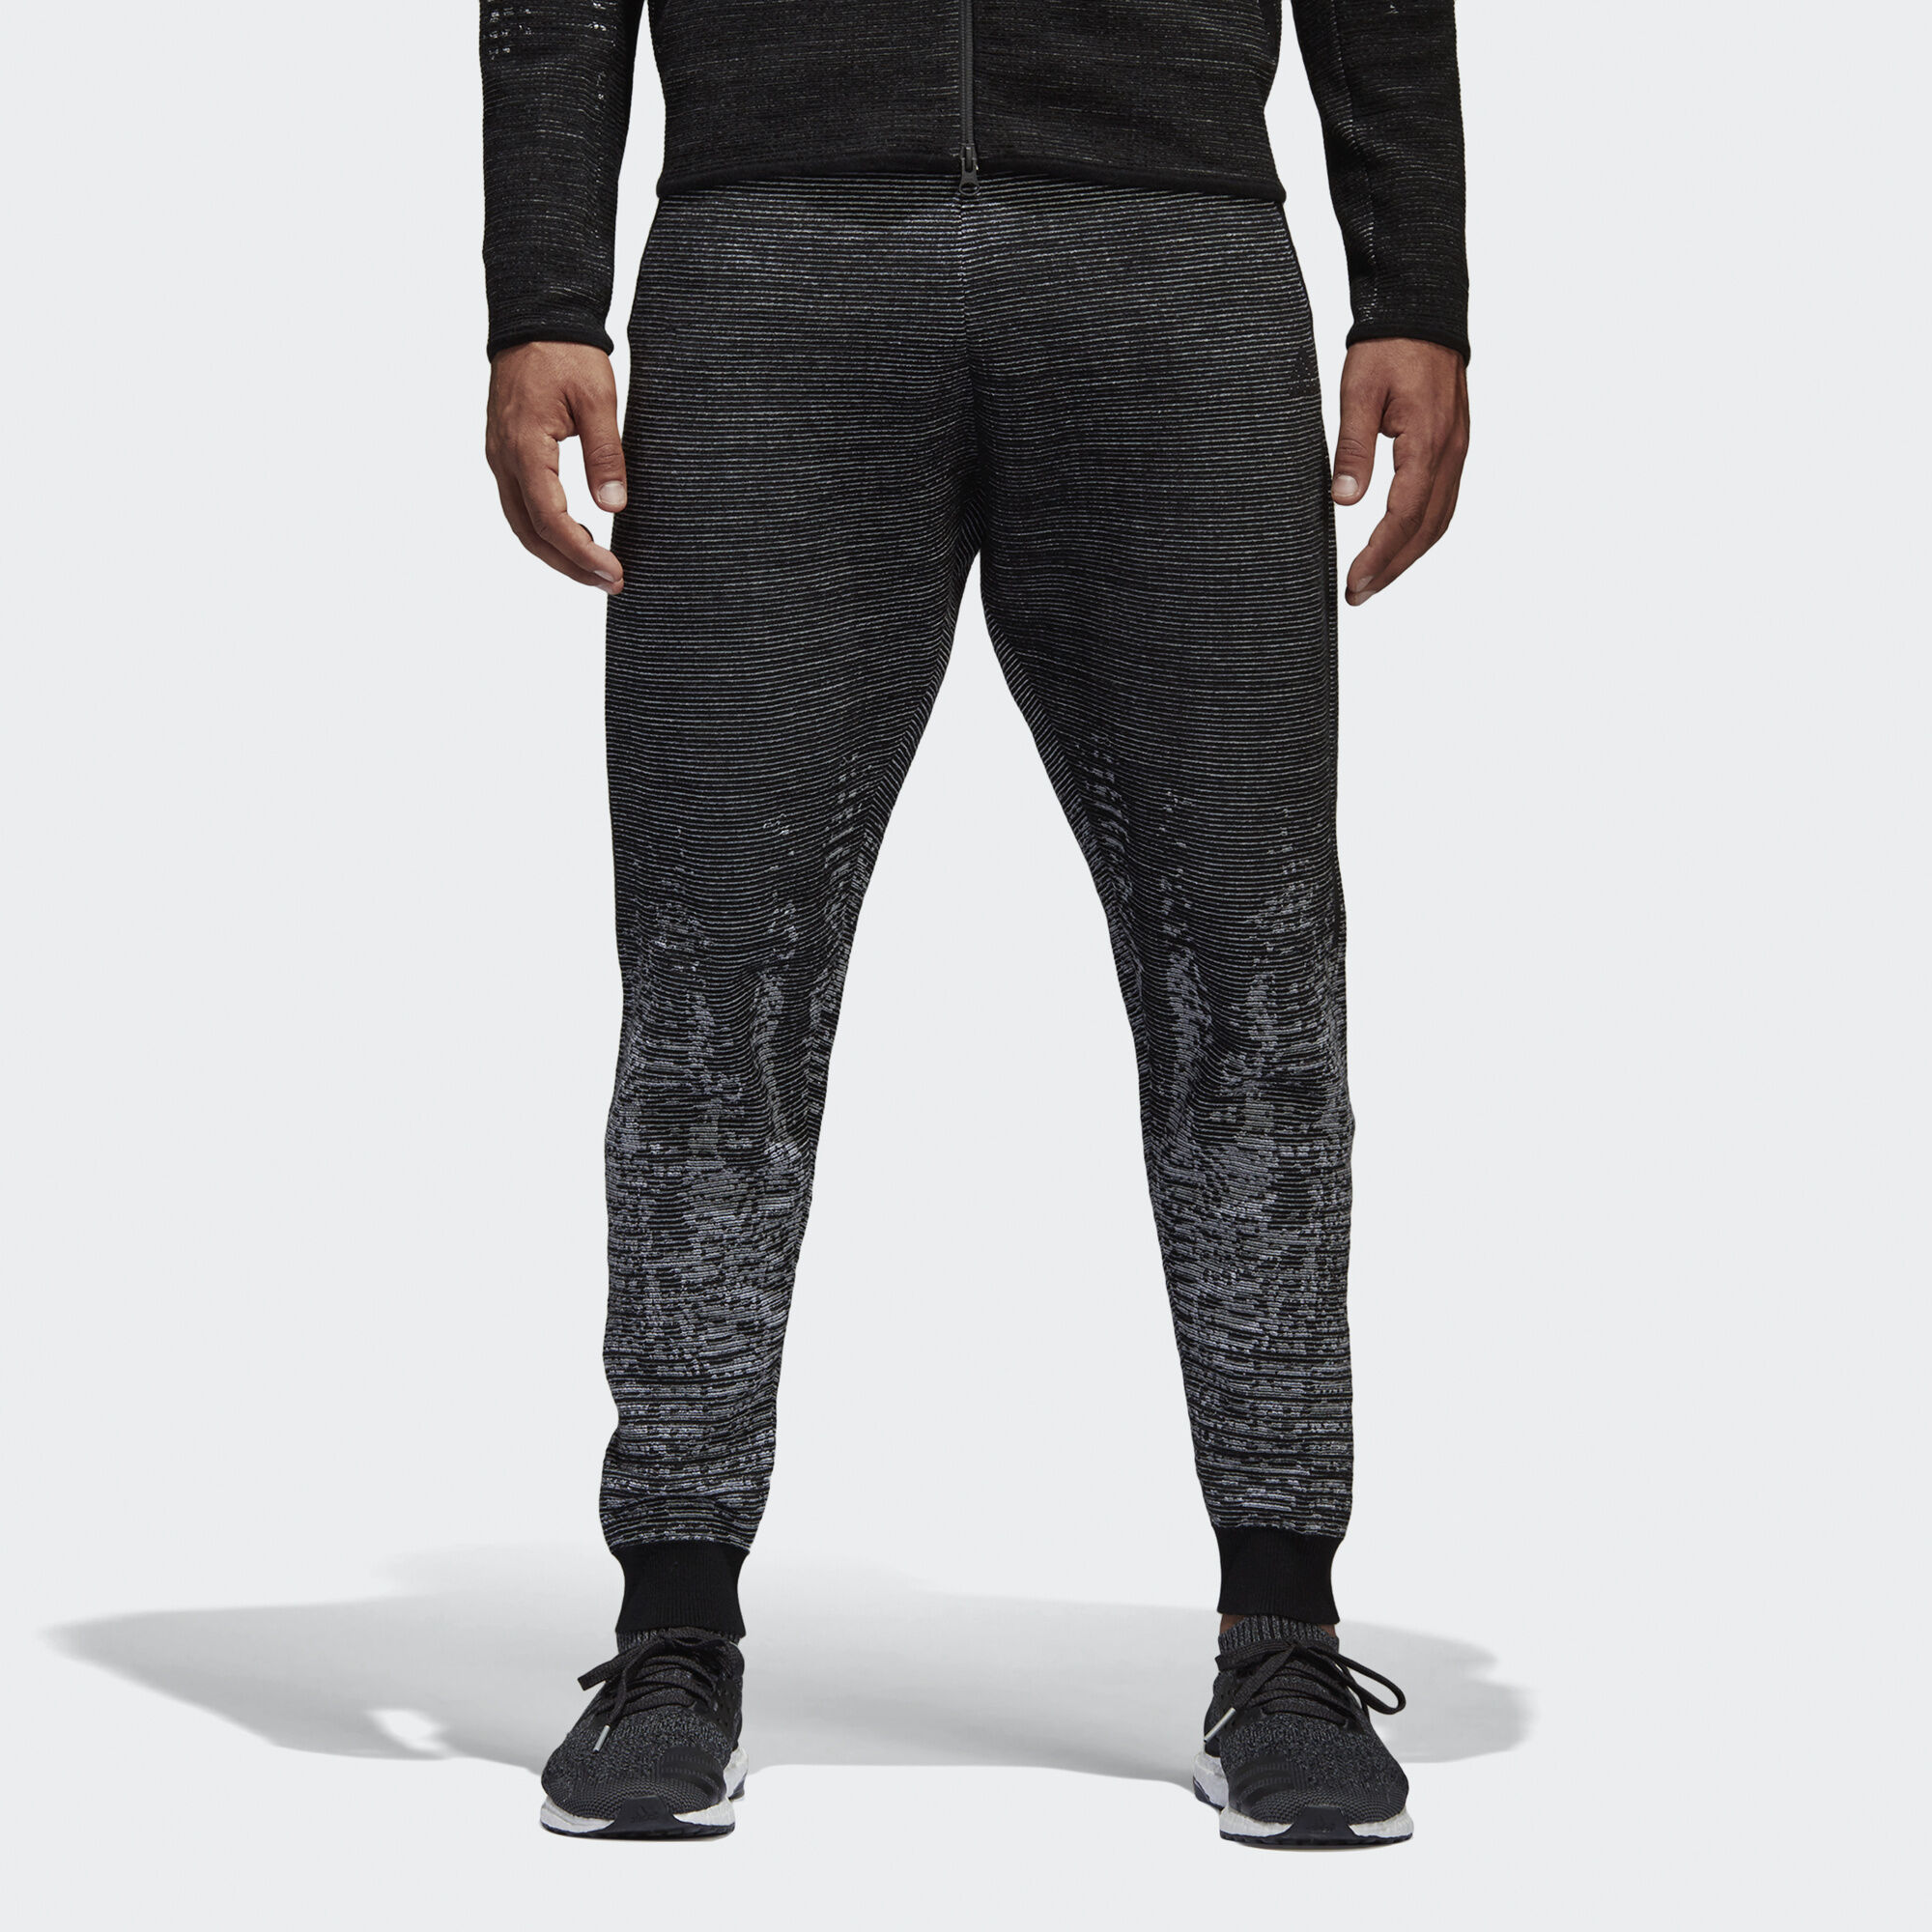 adidas - Pantalón adidas Z.N.E. Pulse Black/Off White BQ4840. Hombre  Athletics